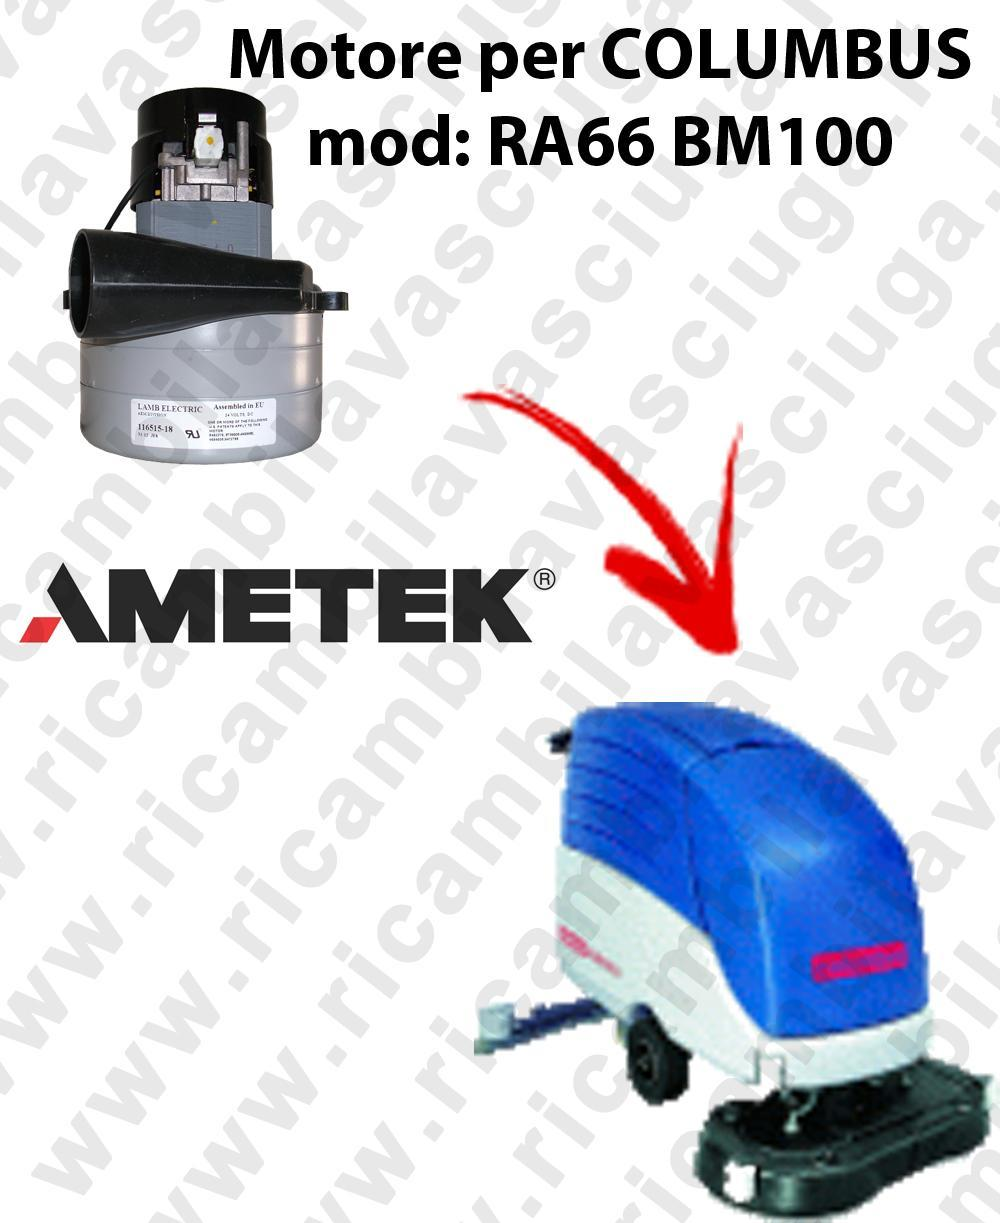 RA66 BM100 Motore de aspiración LAMB AMETEK para fregadora COLUMBUS